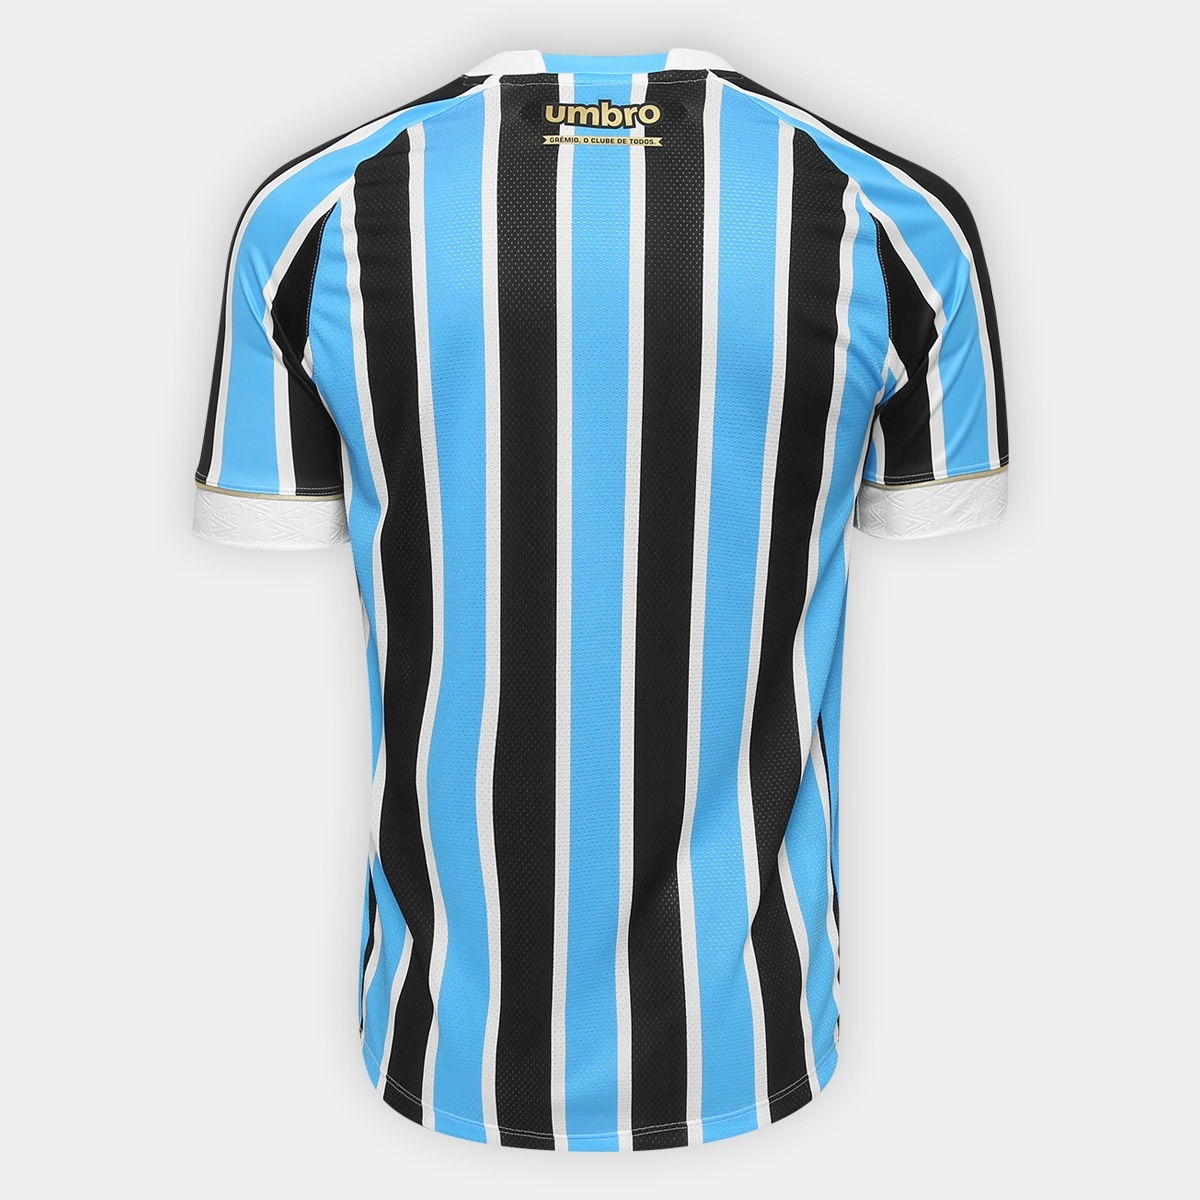 6f8b5bd2d7 Camisa Grêmio I 18 19 S n° Torcedor Umbro Masculina - R  289